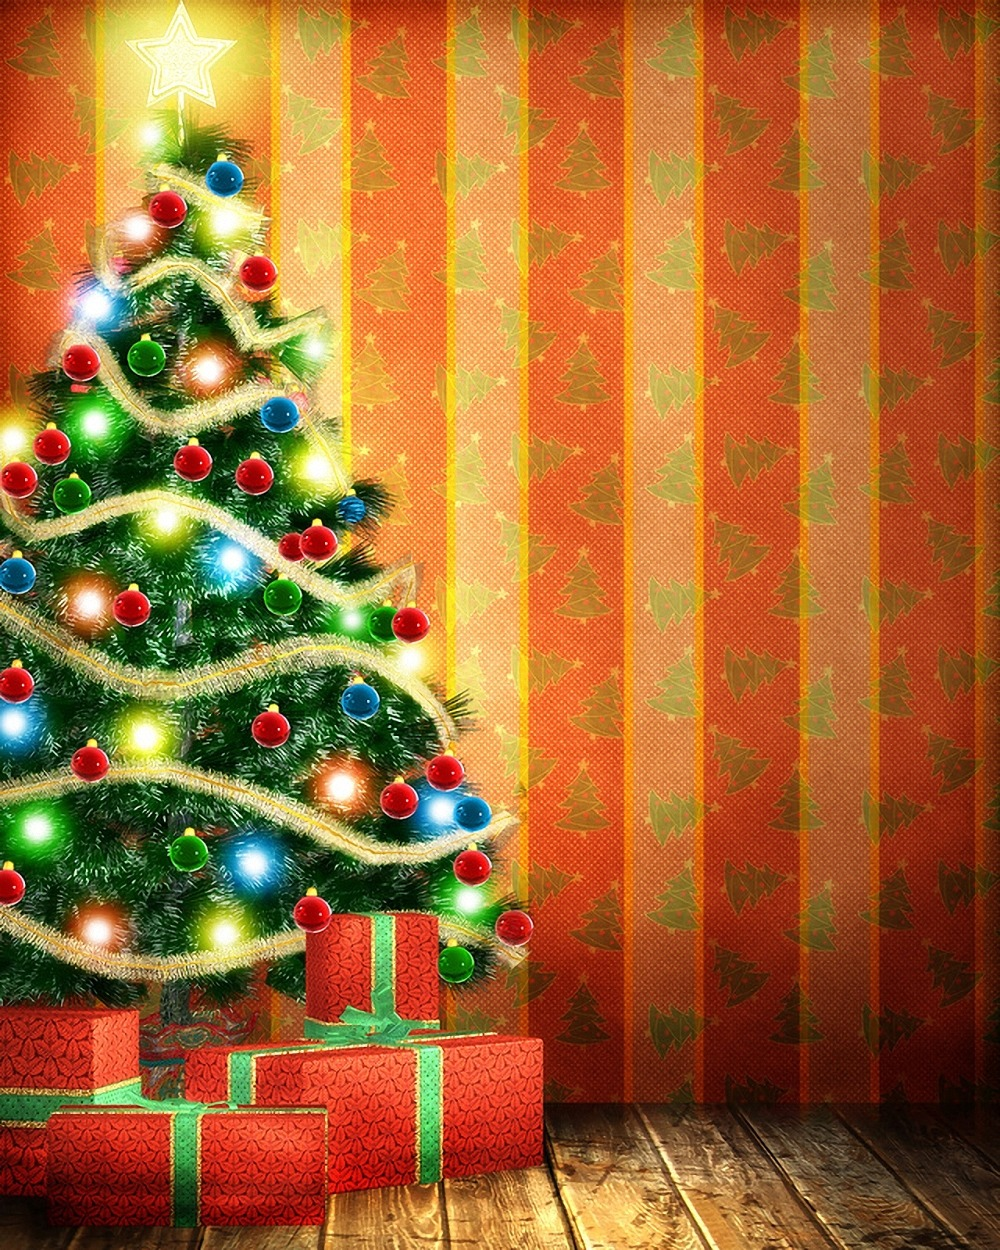 Новогодние елки картинки фон